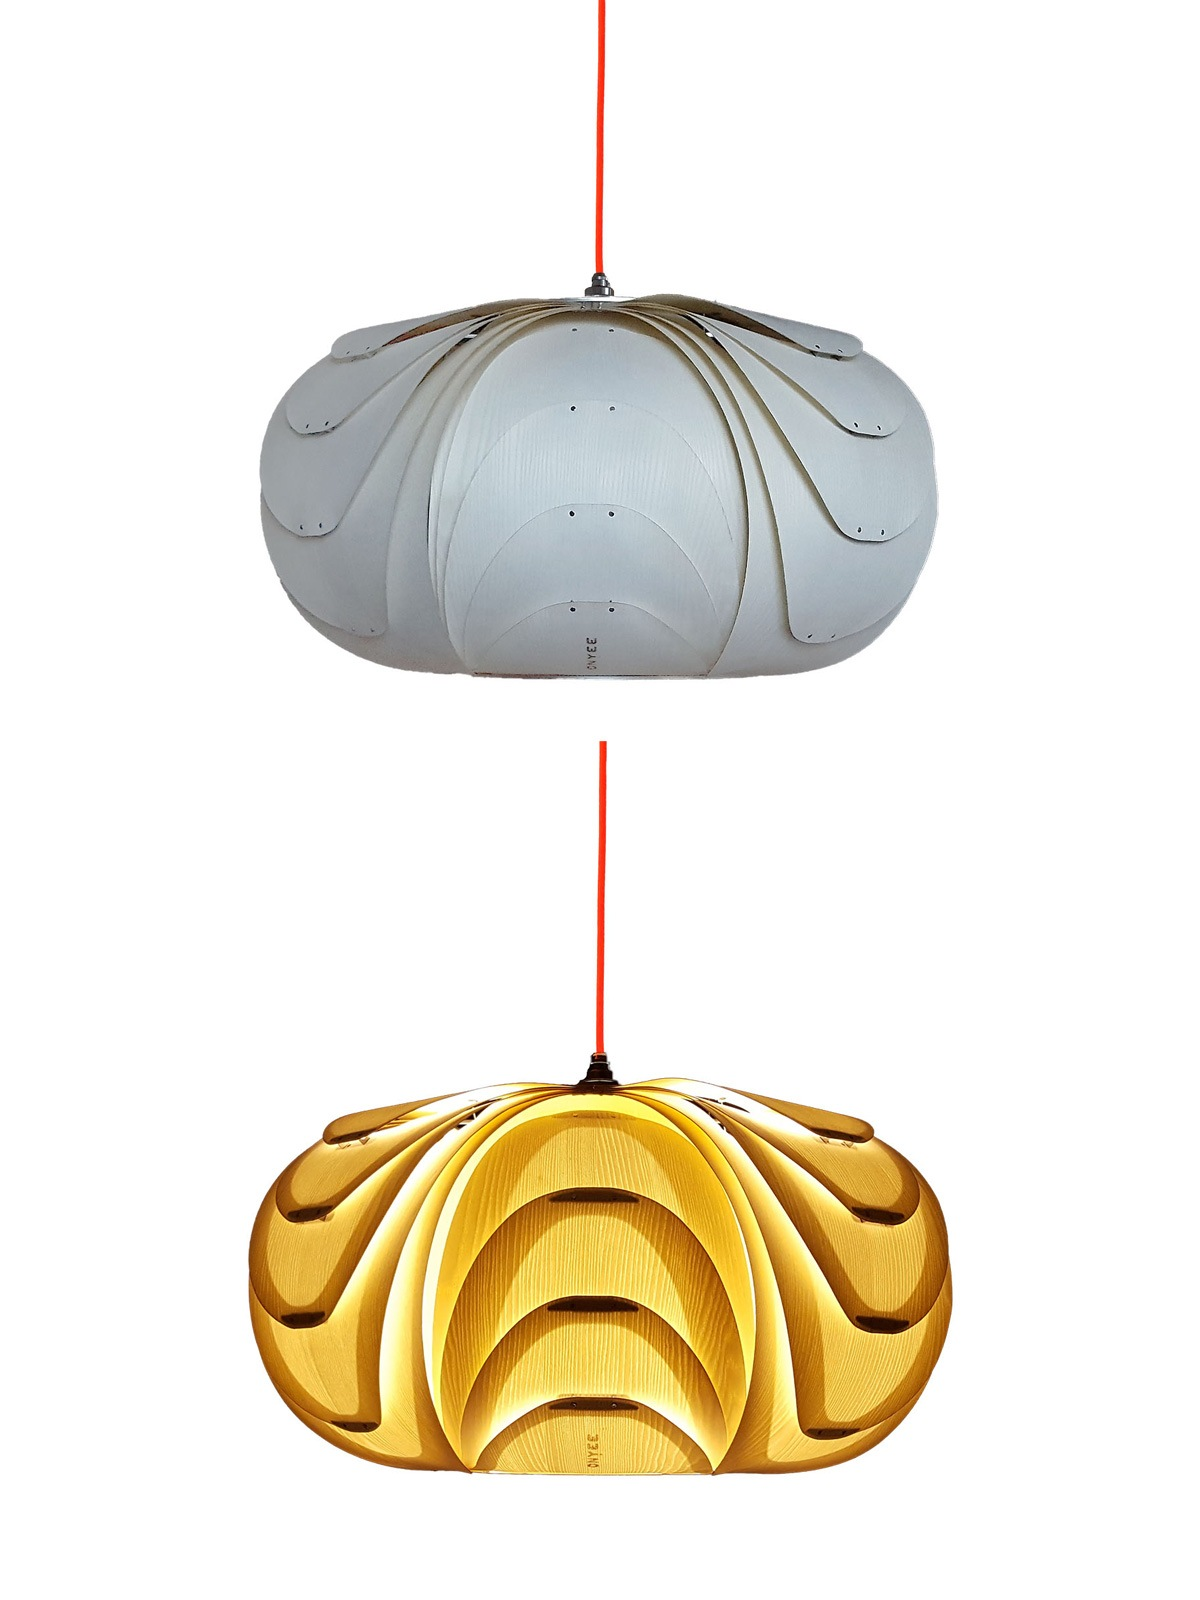 ONYEE Lights ANIDA Weiss Holz Leuchte Designort Onlineshop Lampen